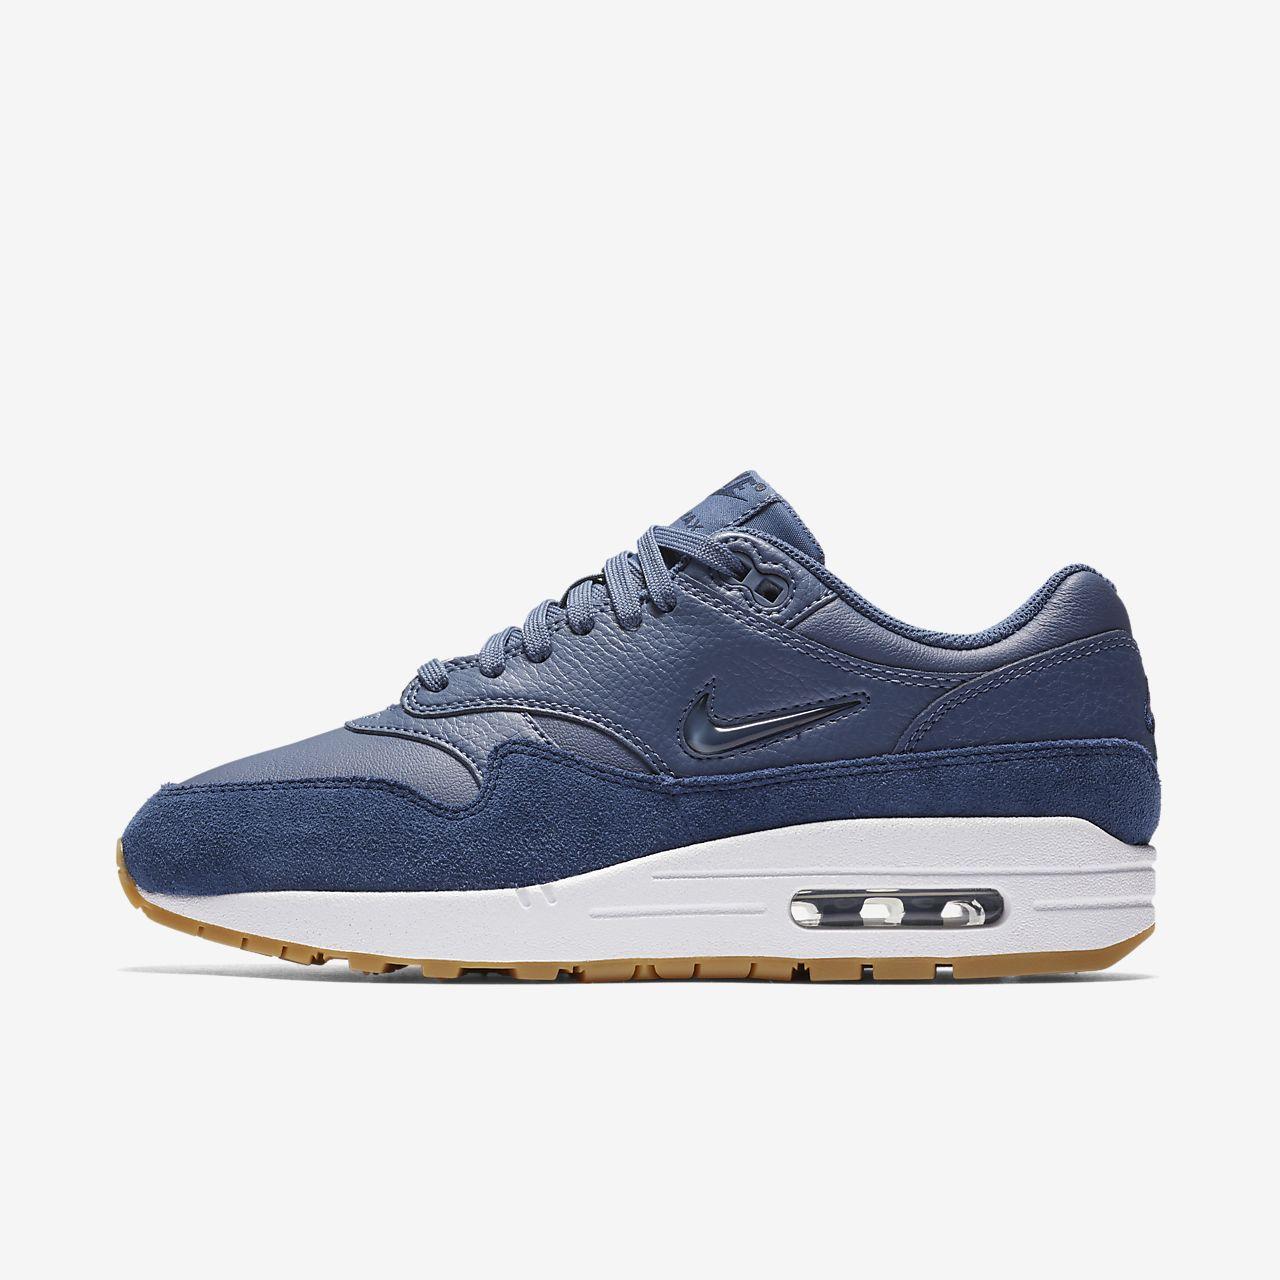 Air Max Jewell Se Noir Gum Nike Baskets/Running FemmeNike rfG3U1PCao